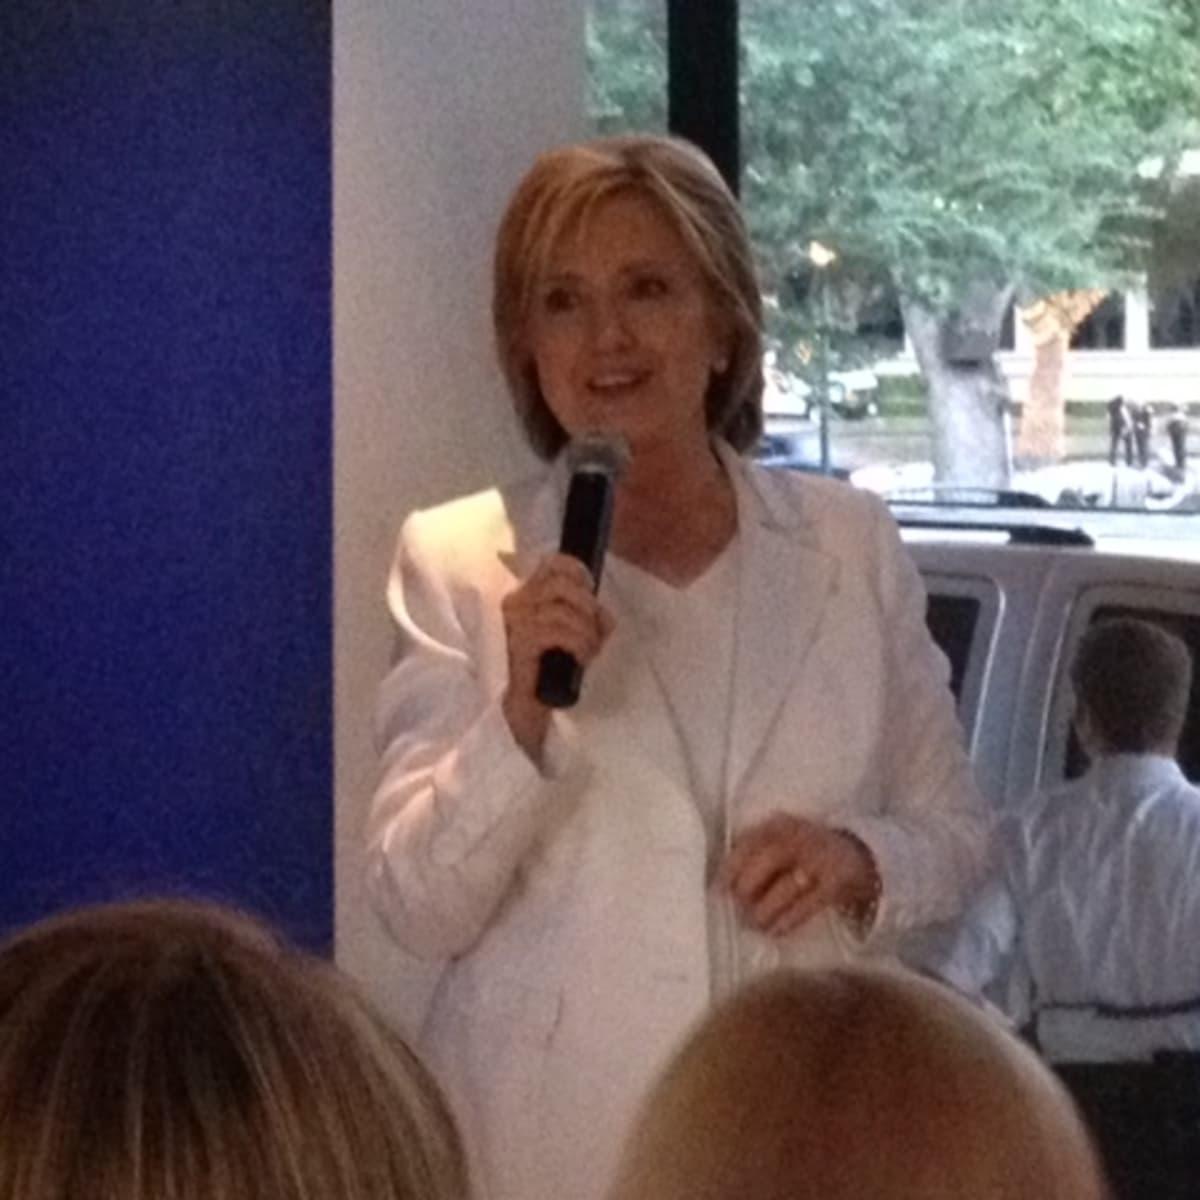 Hillary Clinton at Houston fundraiser